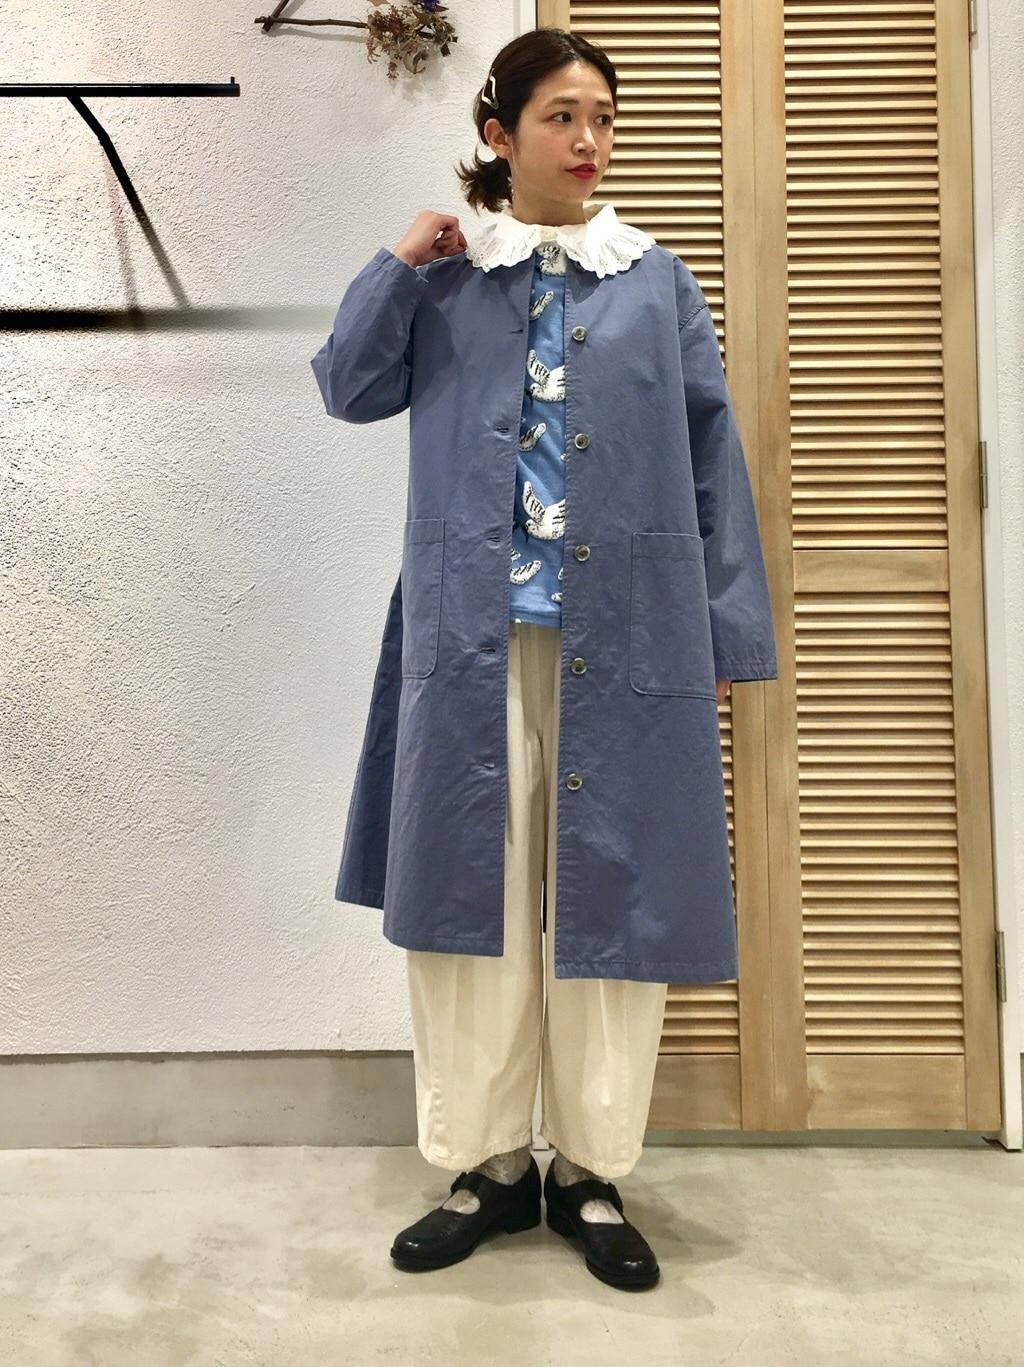 chambre de charme 横浜ジョイナス 身長:160cm 2021.02.27